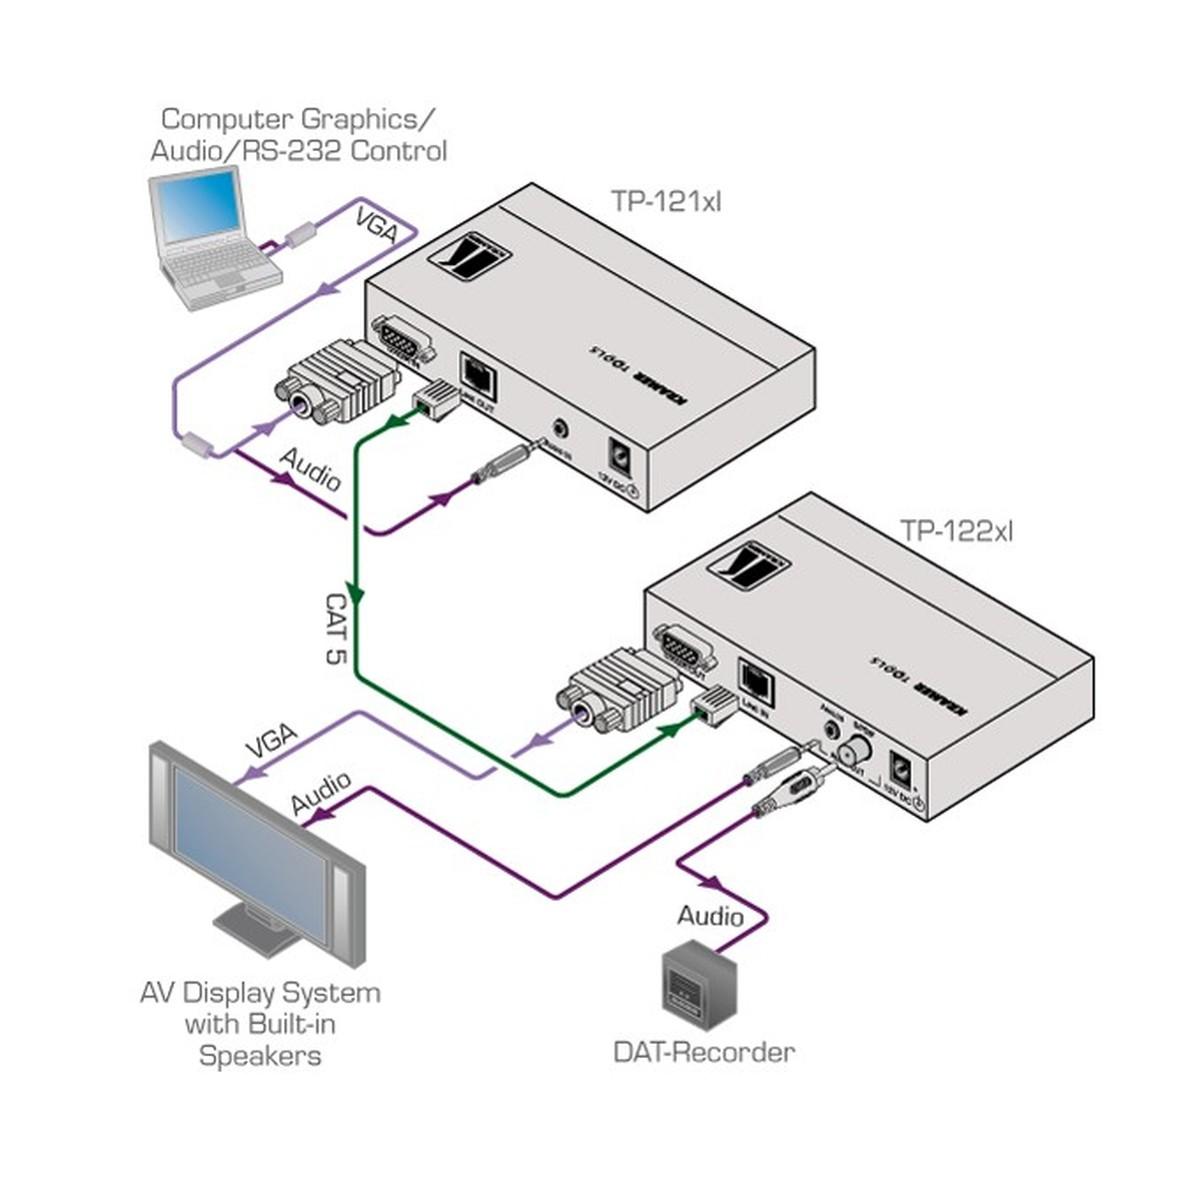 kramer vga wiring diagram standard vga wiring diagram kramer tp-122xl 50-80177390 vga & stereo audio over cat5 ... #11